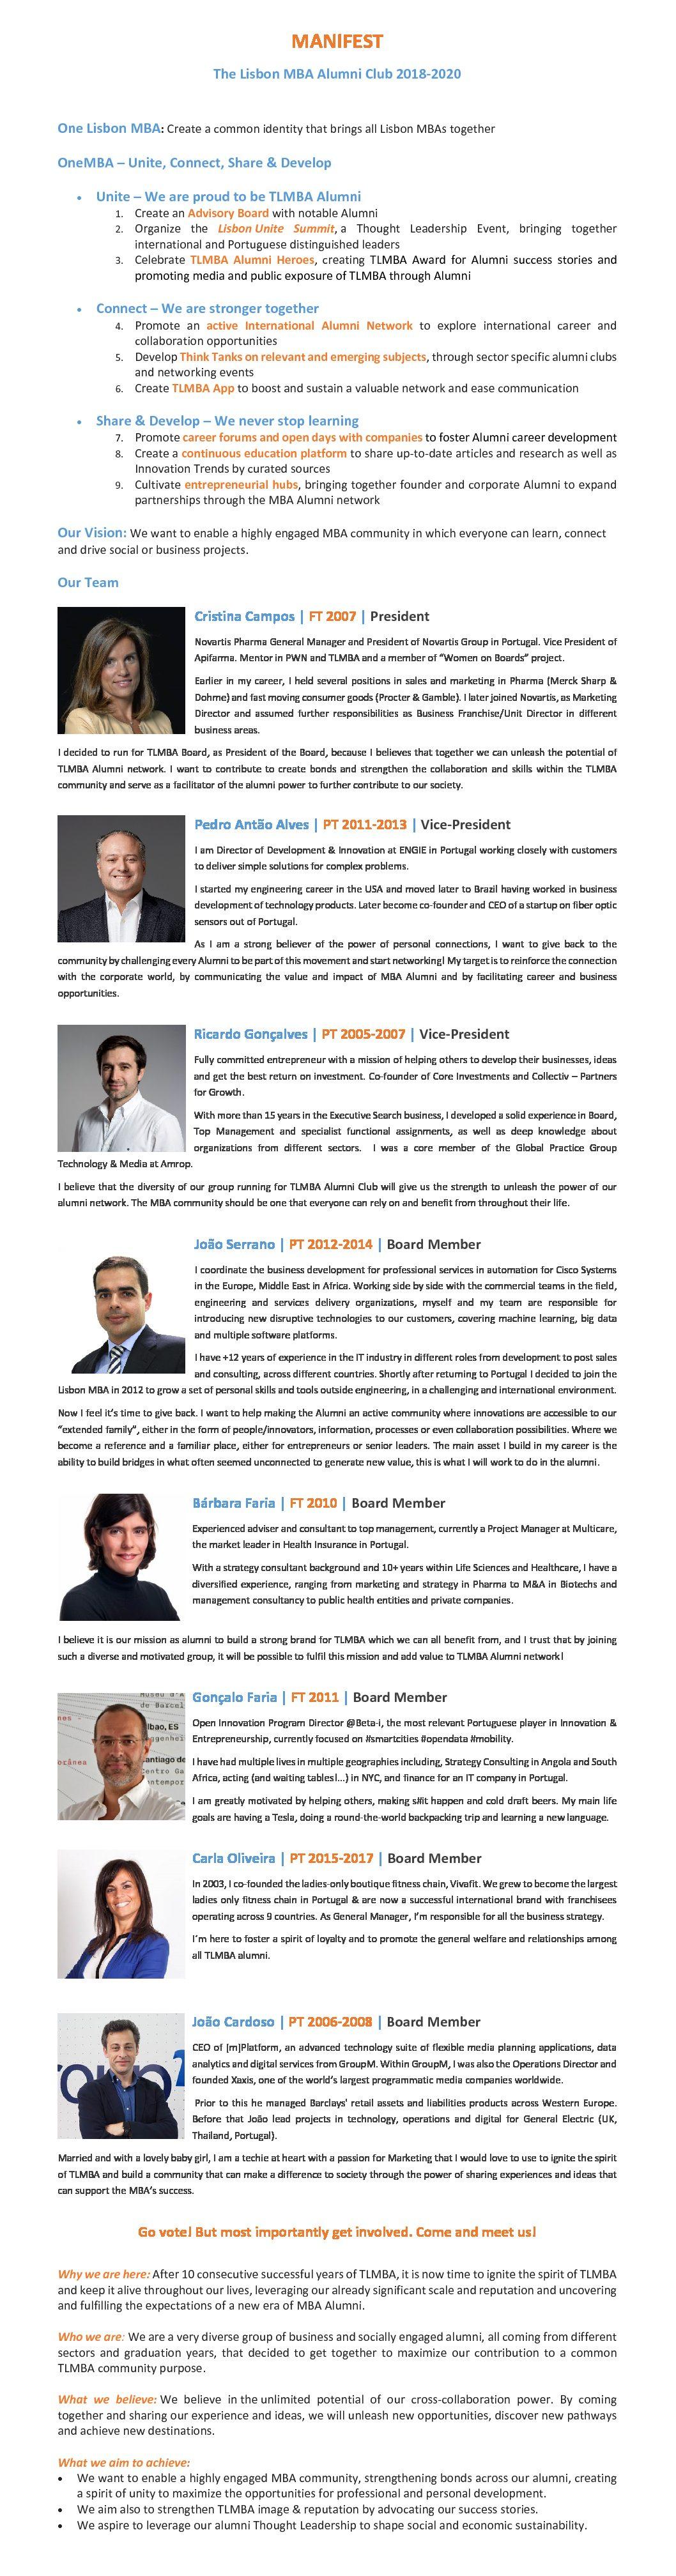 The-Lisbon-MBA-Alumni-Club-Manifest-pdf-1 – The Lisbon MBA | MBA and